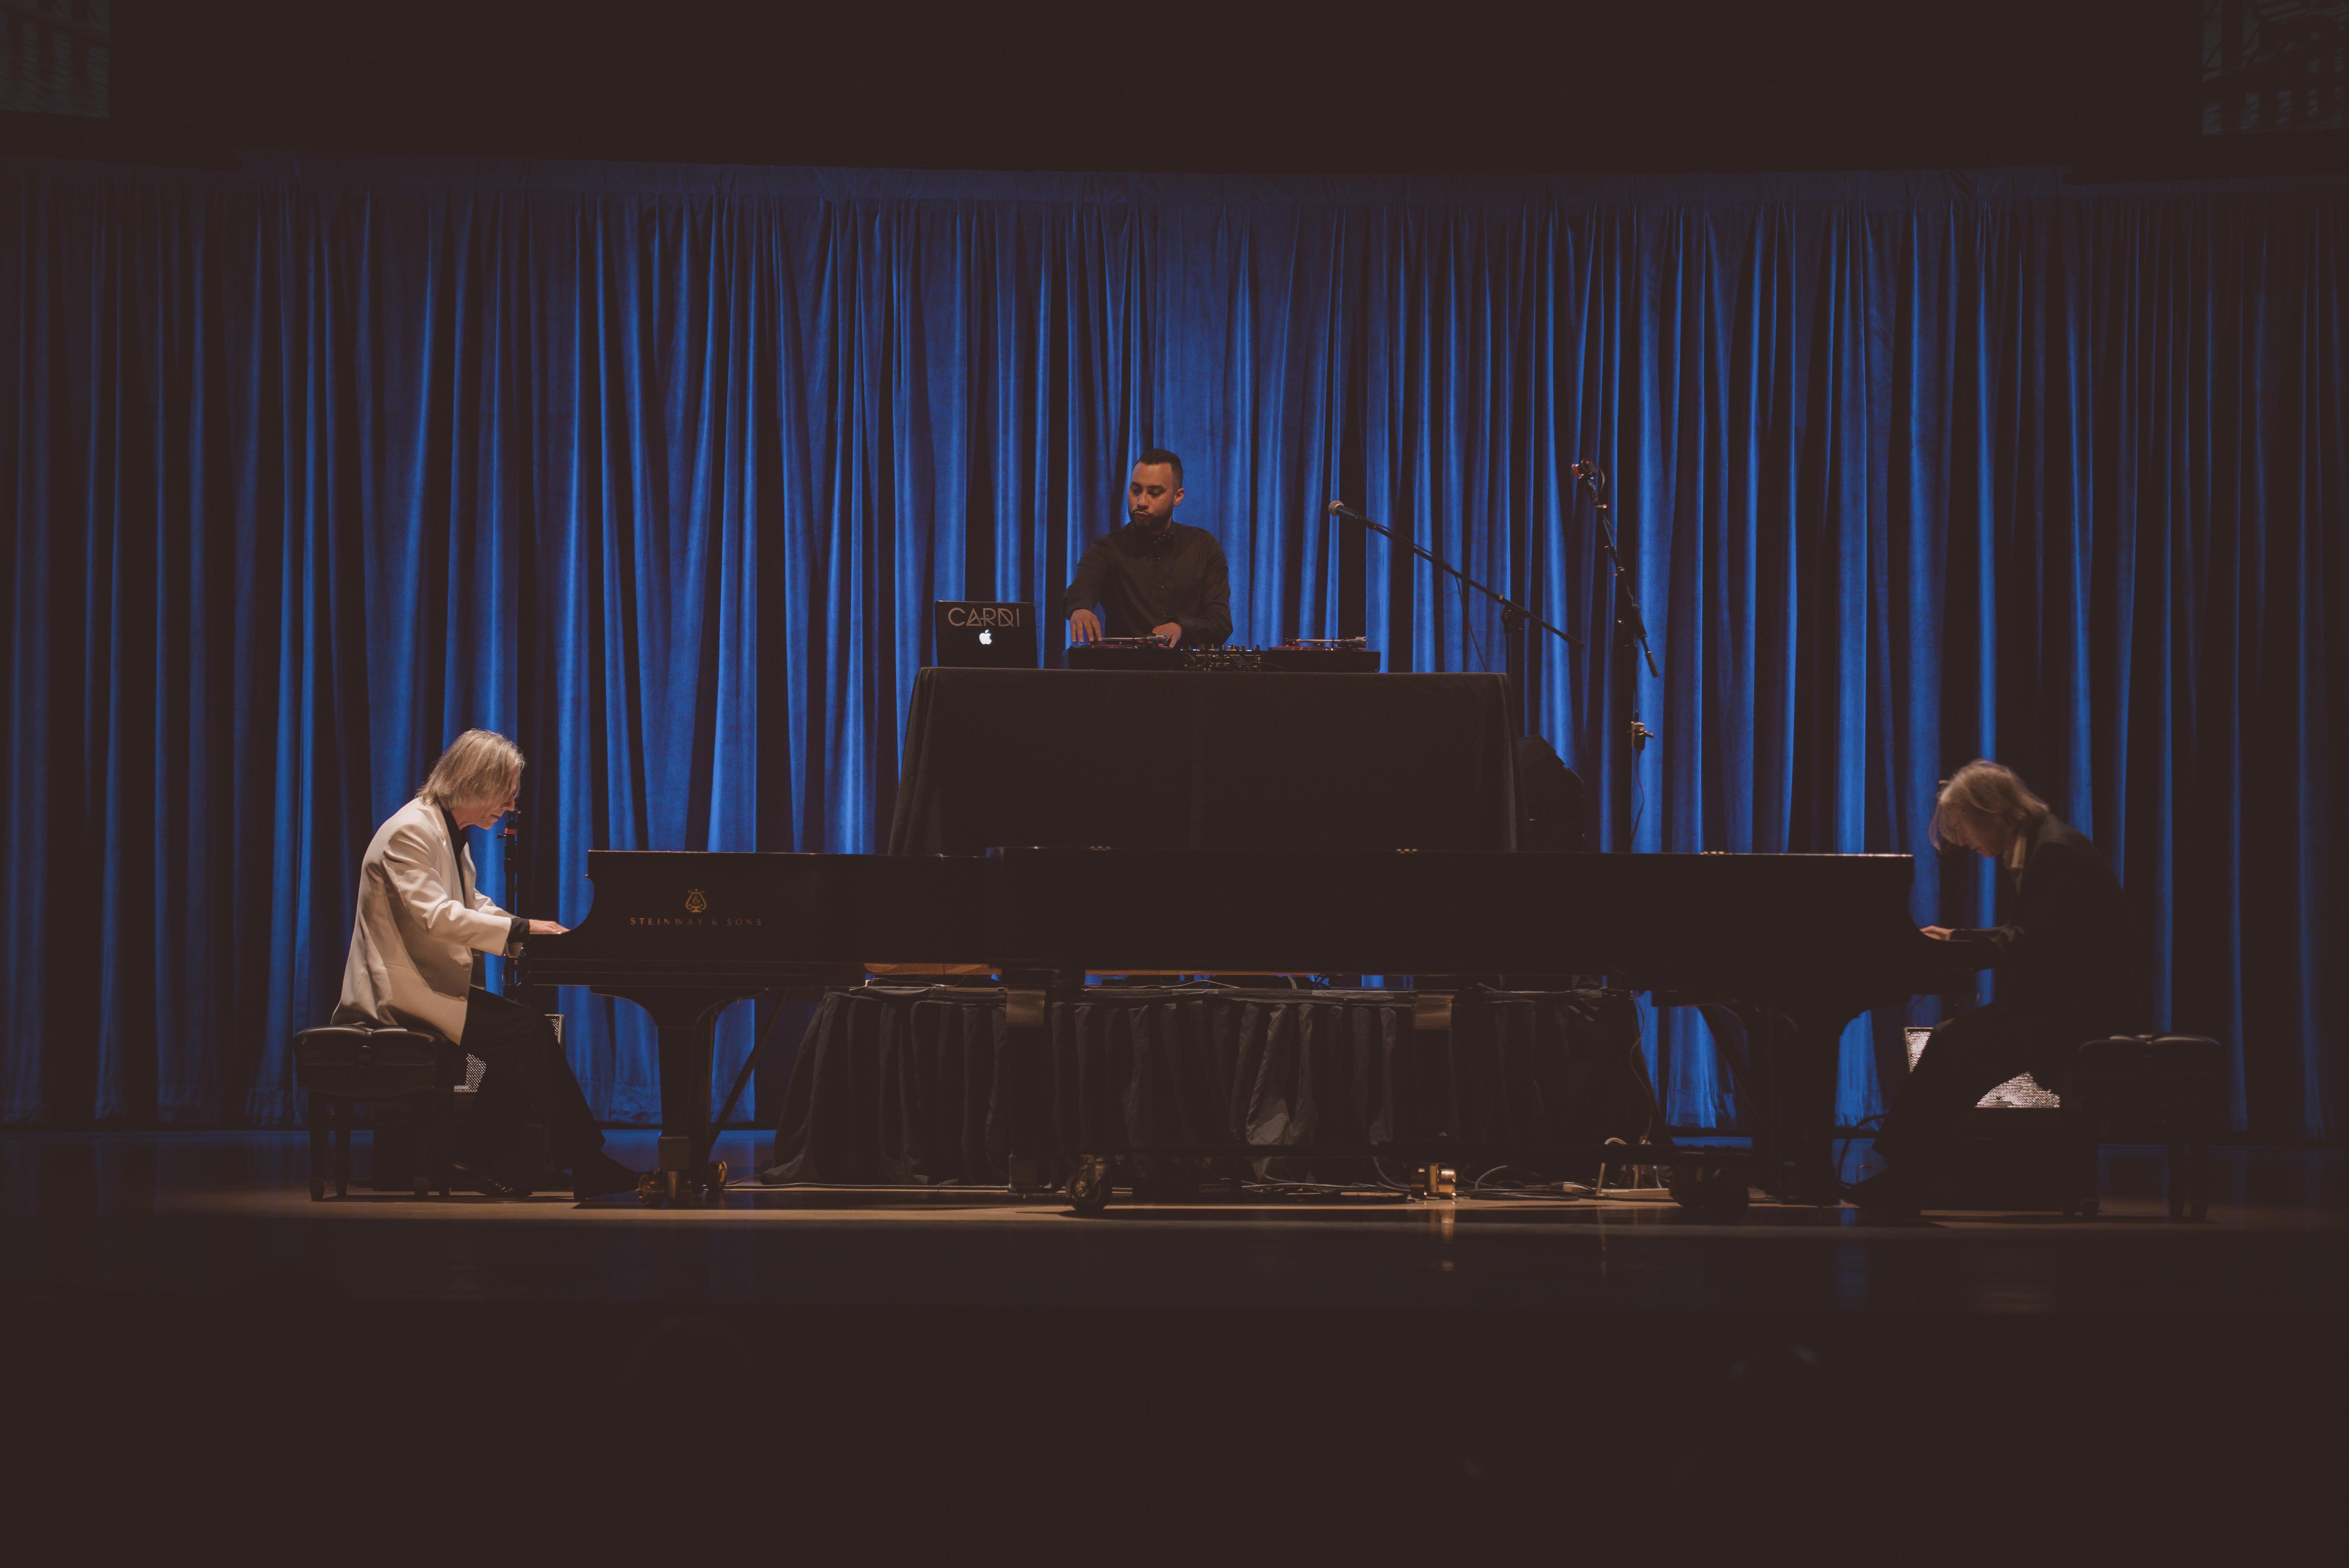 KnightCenterHall-PianoSlam10-26